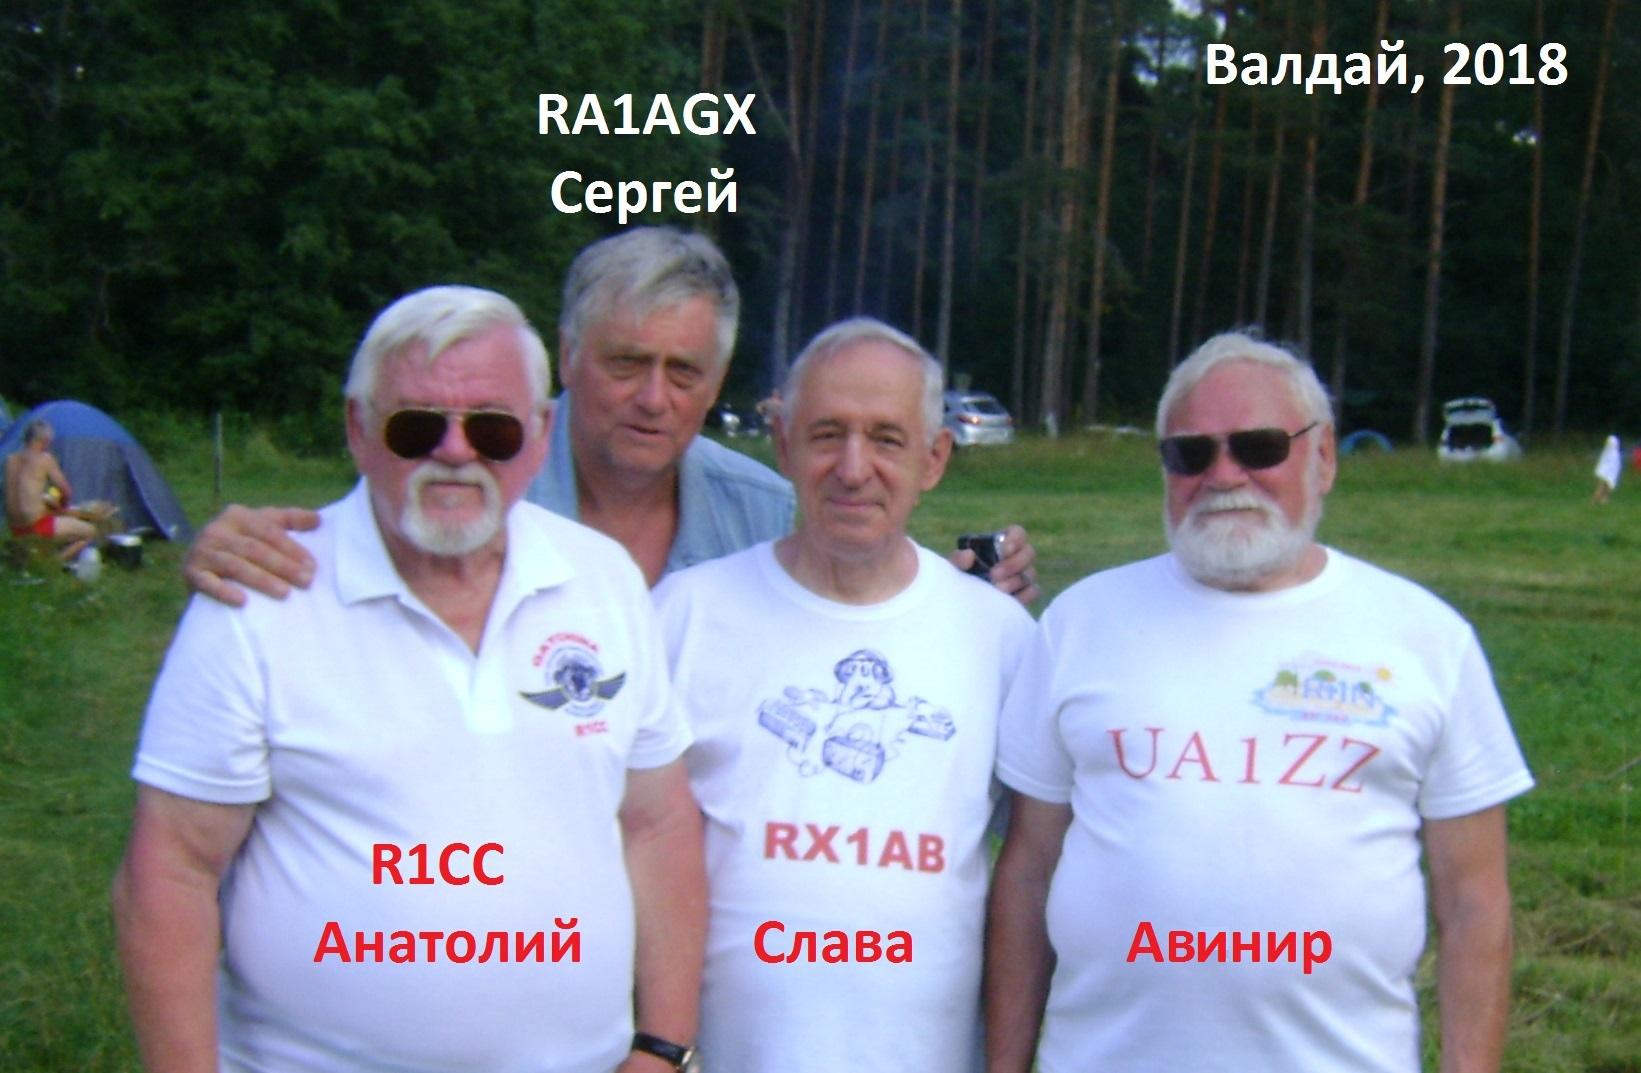 Нажмите на изображение для увеличения.  Название:R1CC-RA1AGX-RX1AB-UA1ZZ-2018.JPG Просмотров:1 Размер:392.5 Кб ID:230764